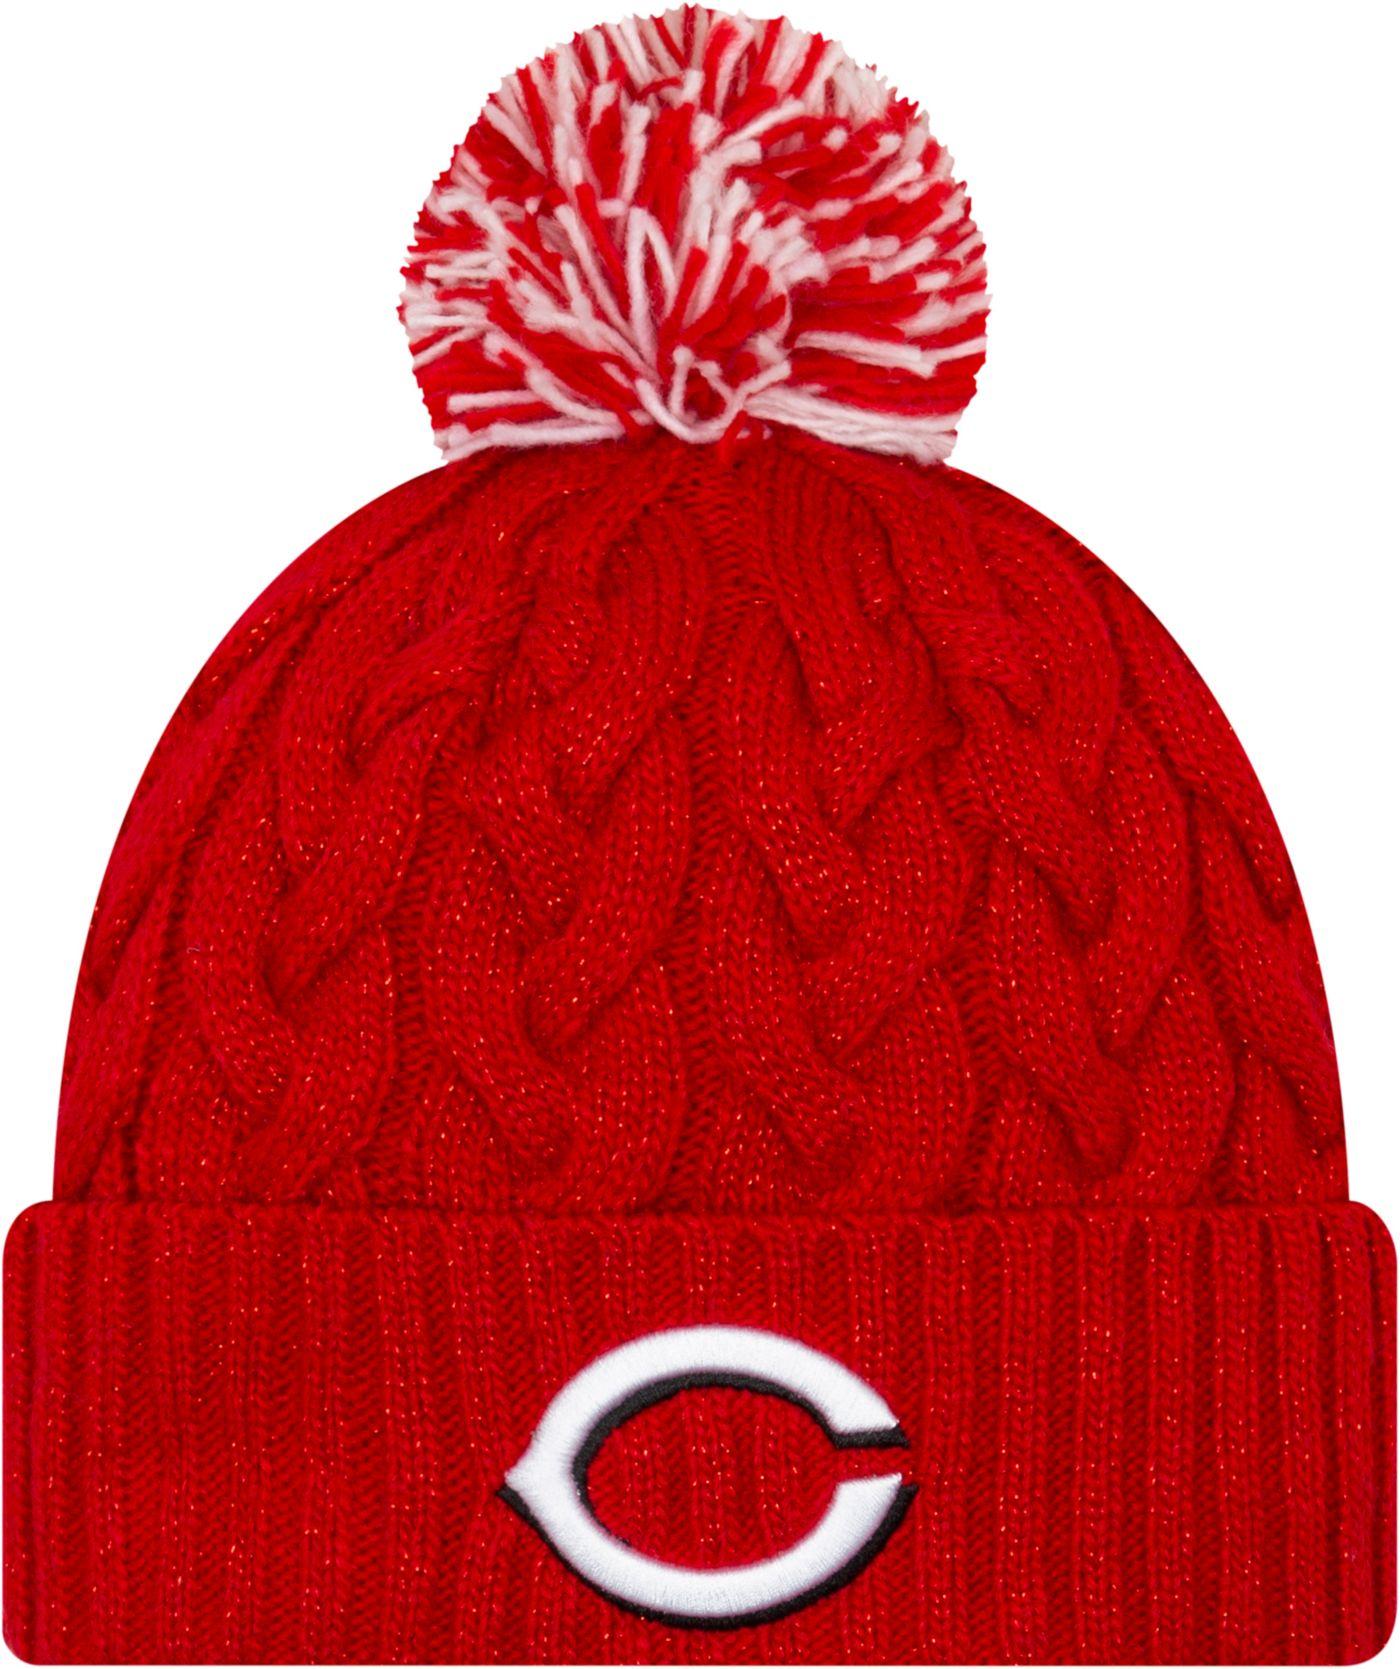 New Era Women's Cincinnati Reds Cozy Cable Knit Hat